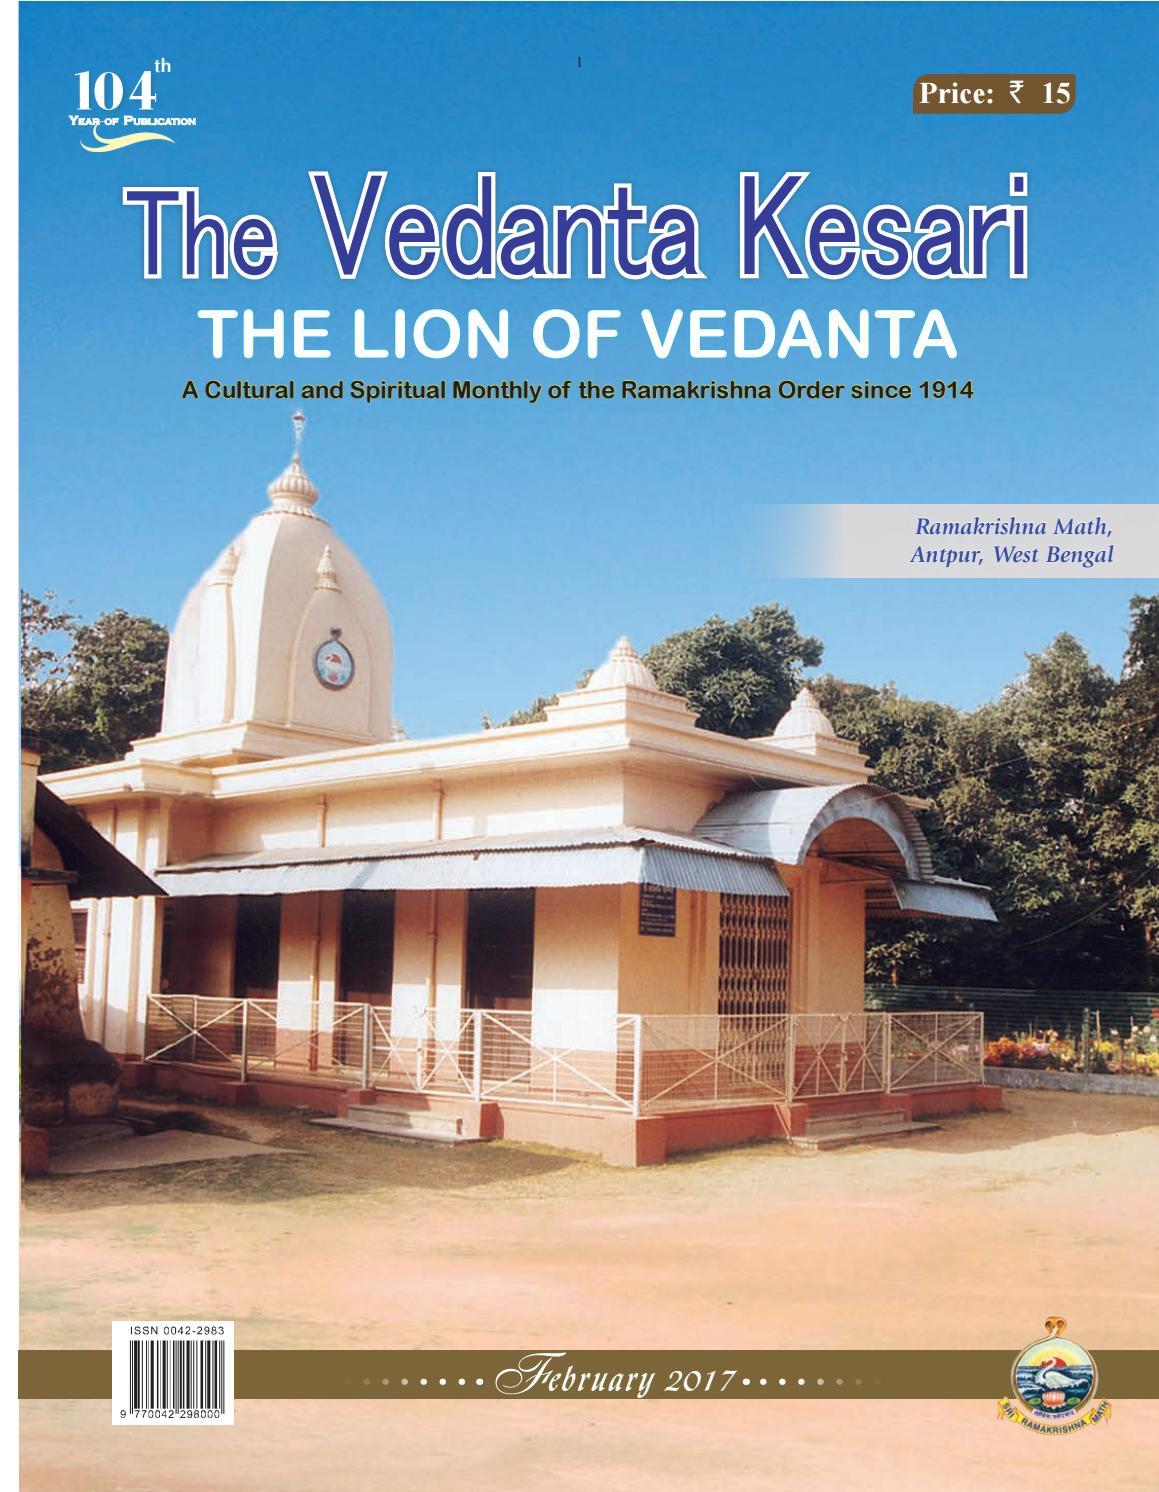 The Vedanta Kesari February 2017 issue by Sri Ramakrishna